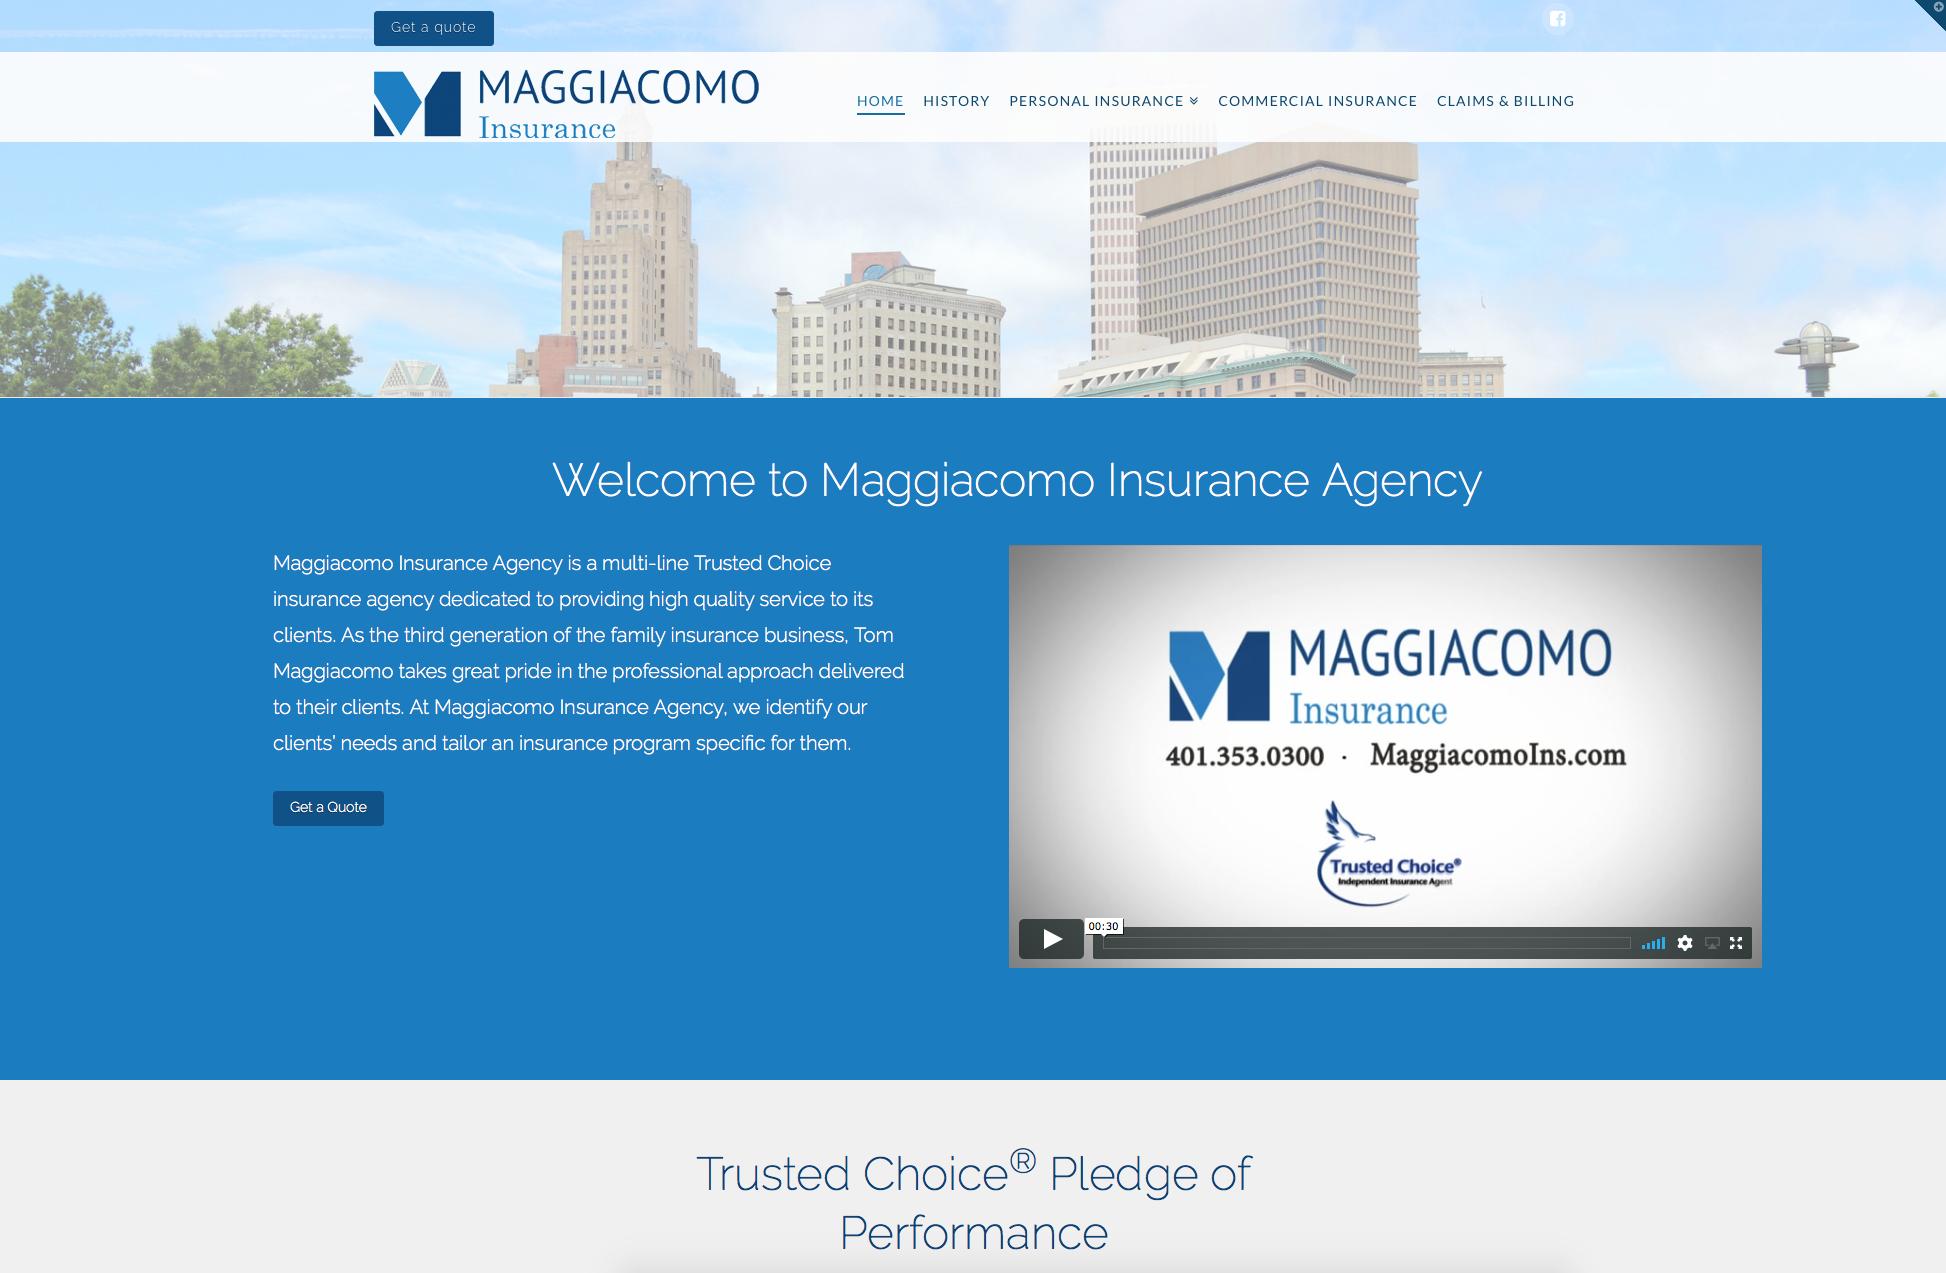 Maggiacomo Insurance